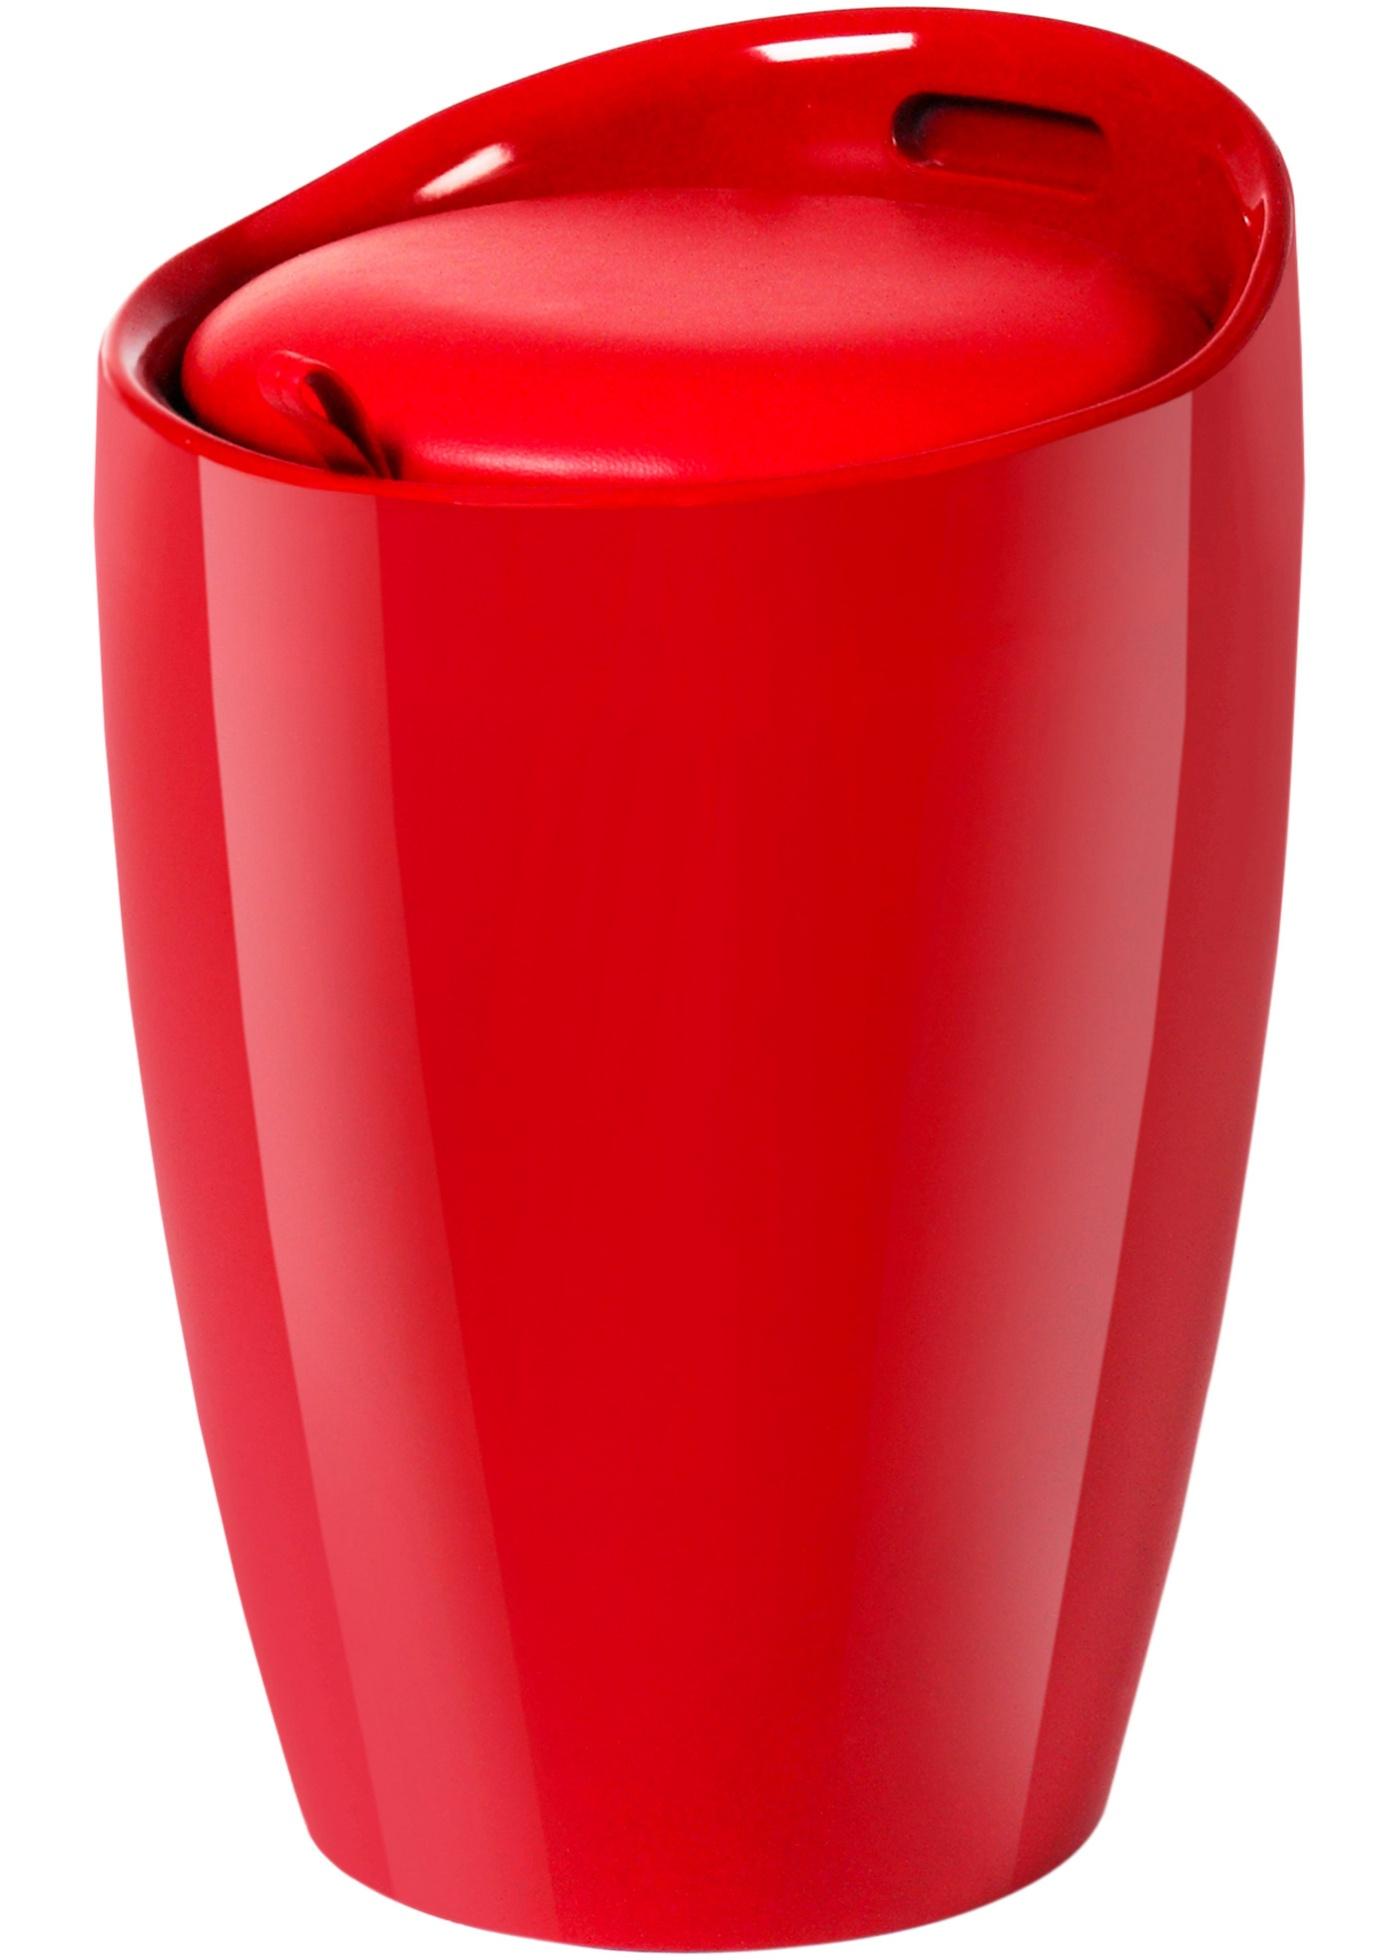 Bonprix Wasmand Candy rood - Meubel Mooi